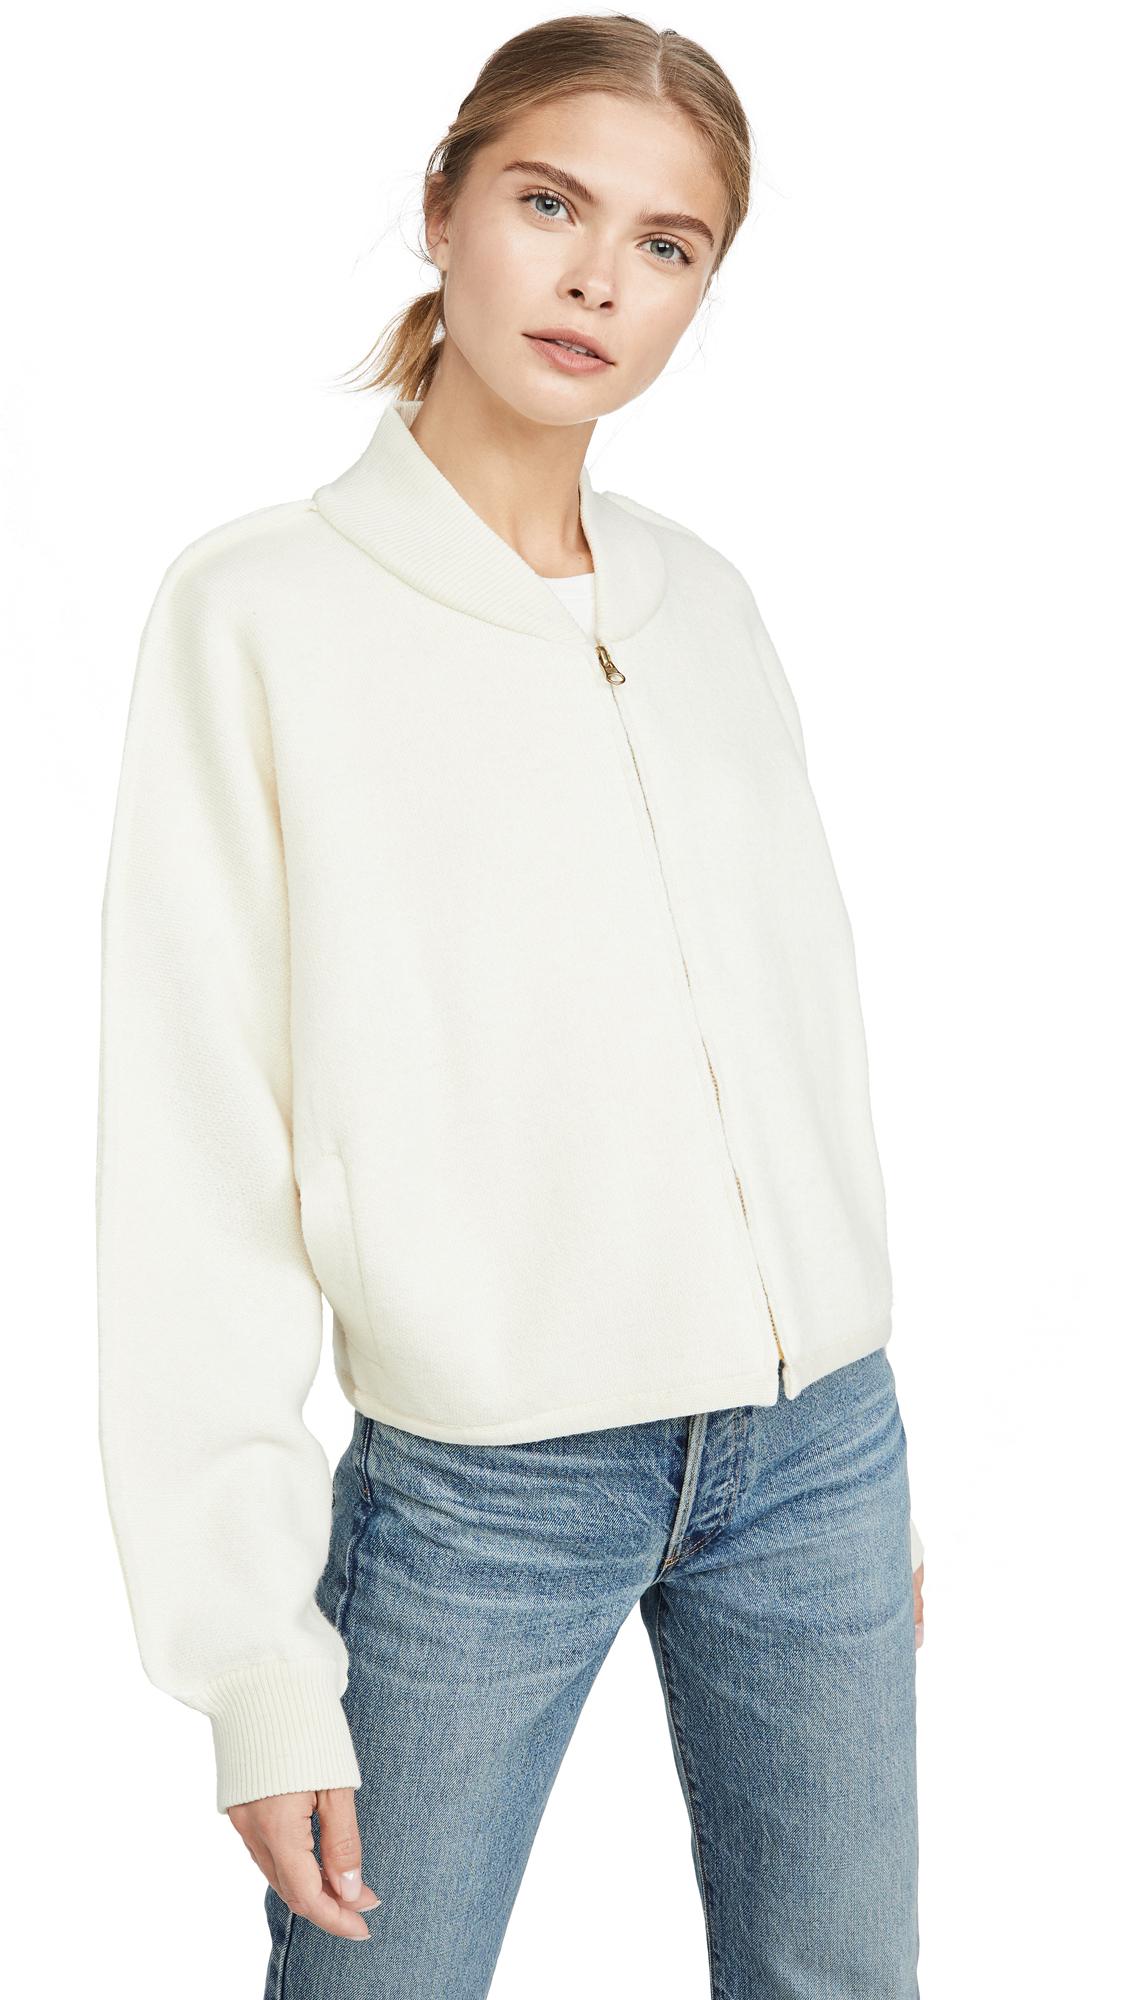 Buy Nation LTD Bette Shrunken Bomber online beautiful Nation LTD Clothing, Jackets